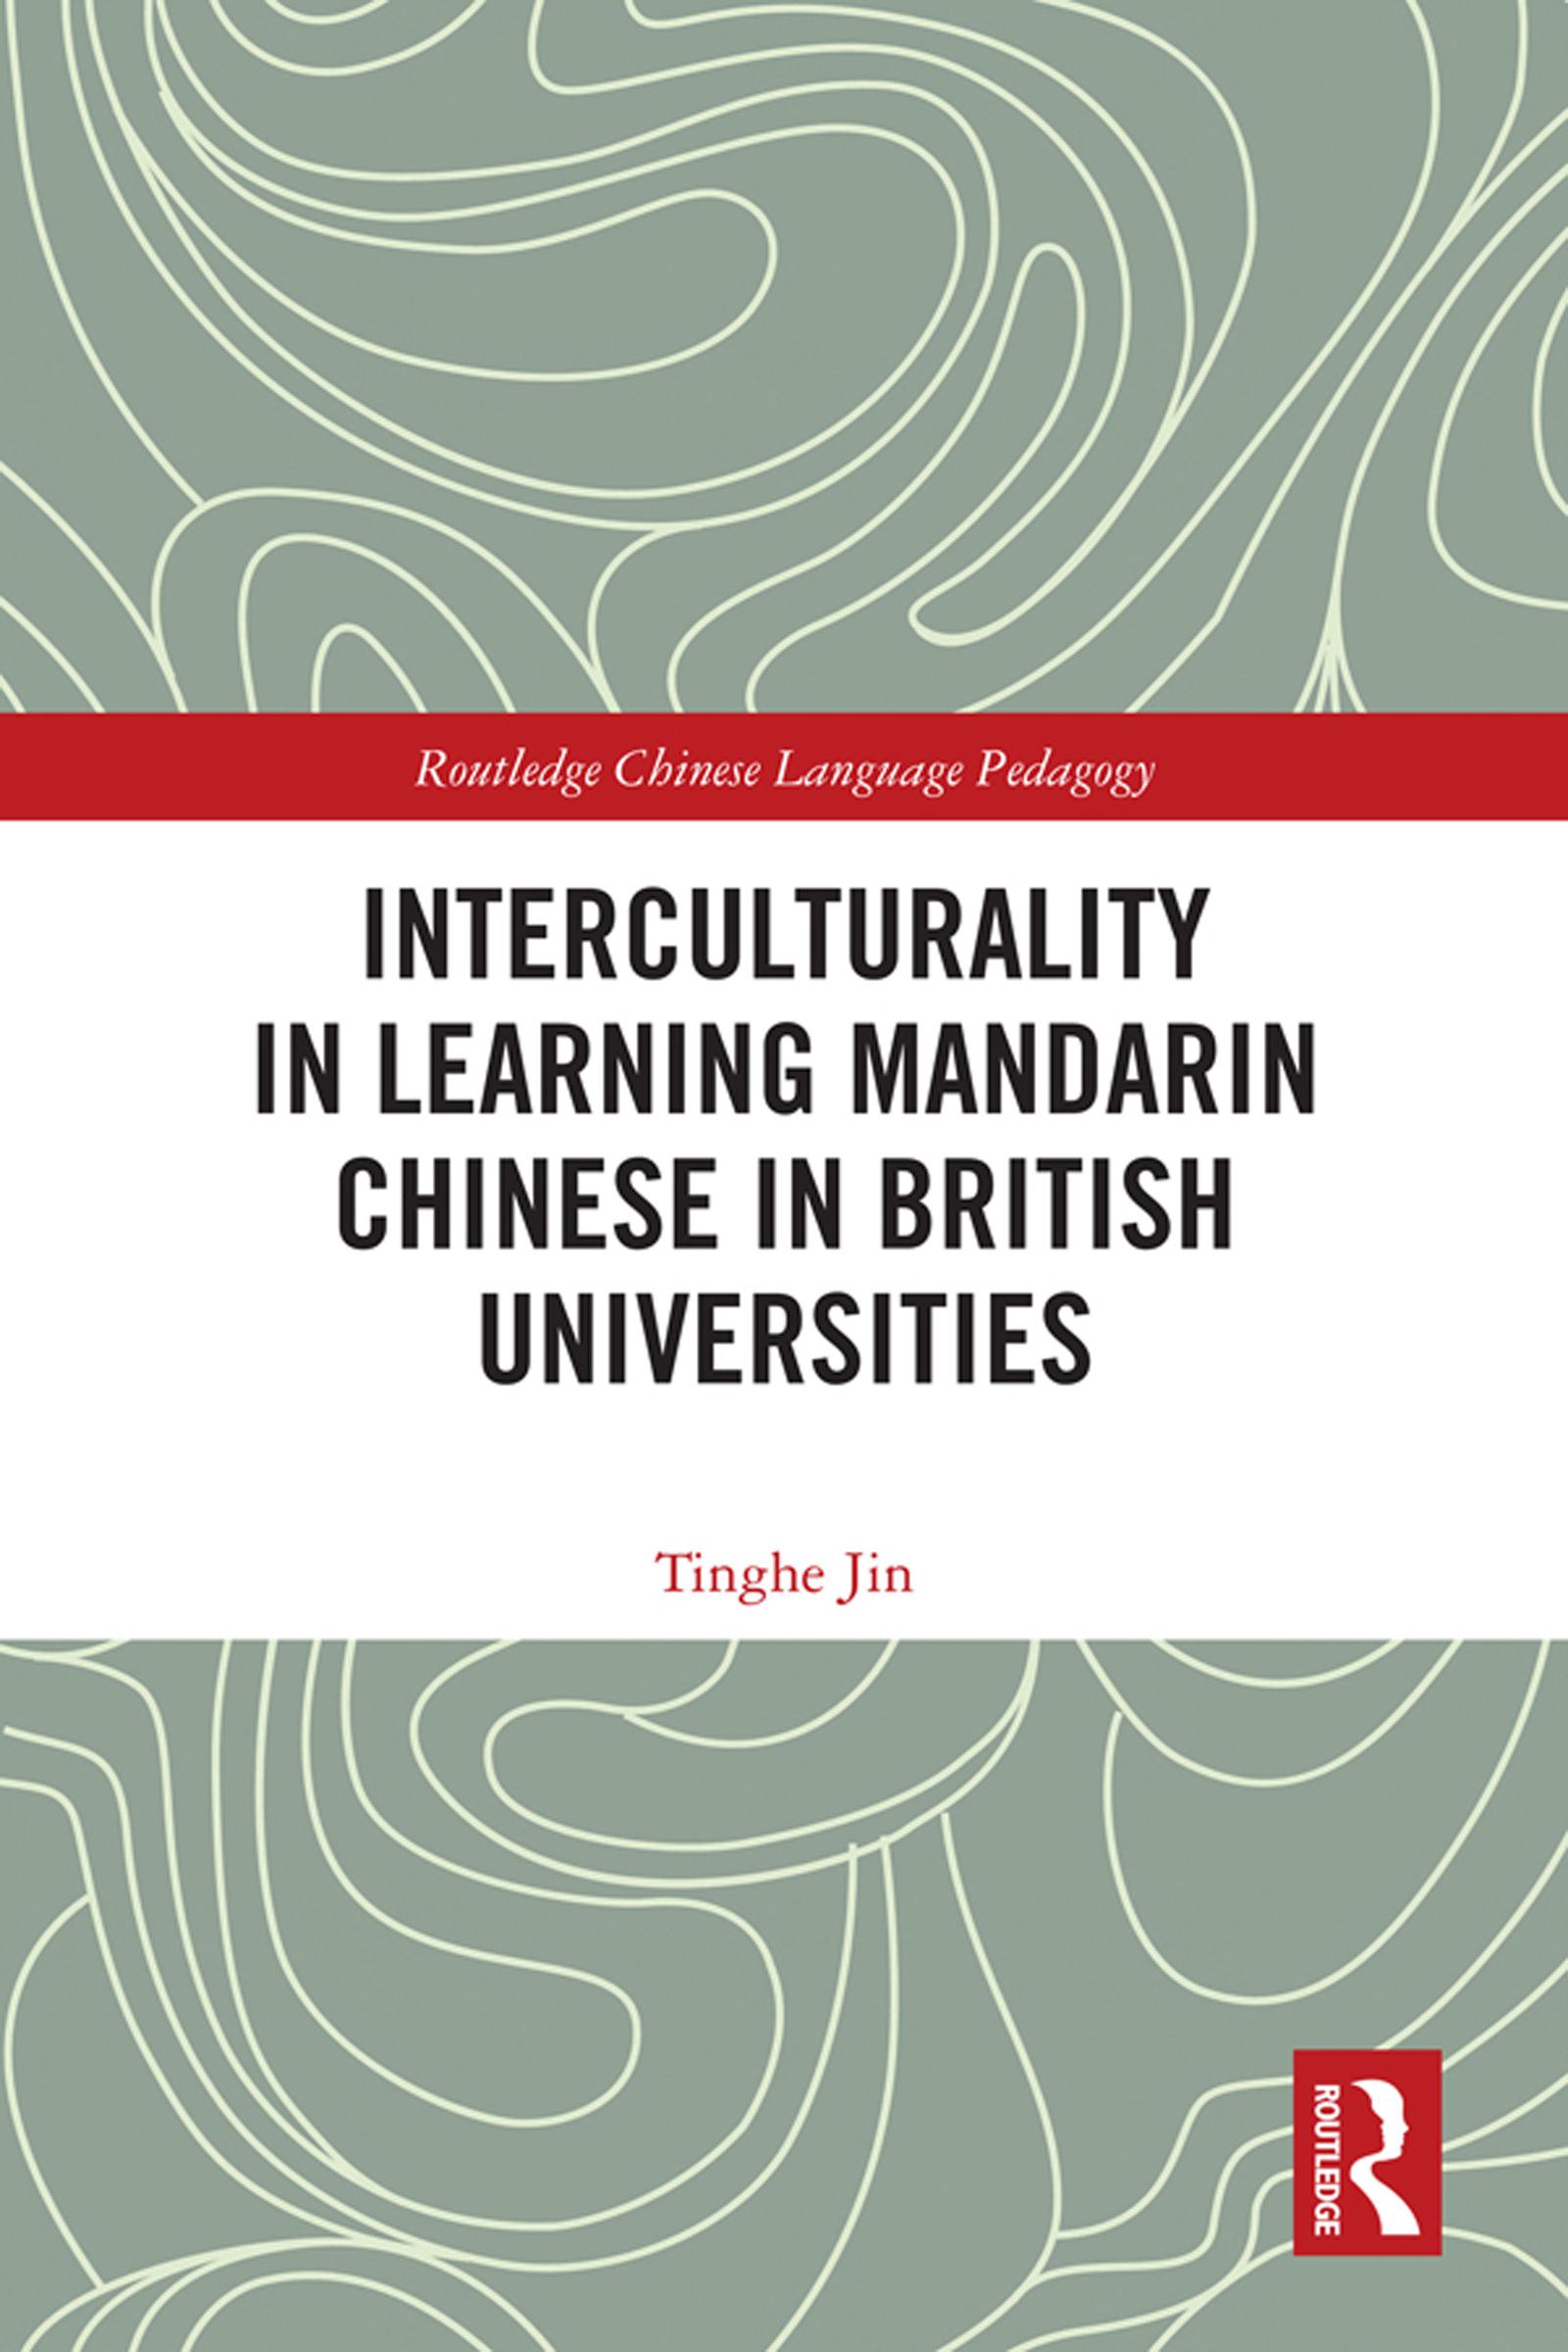 Interculturality in Learning Mandarin Chinese in British Universities